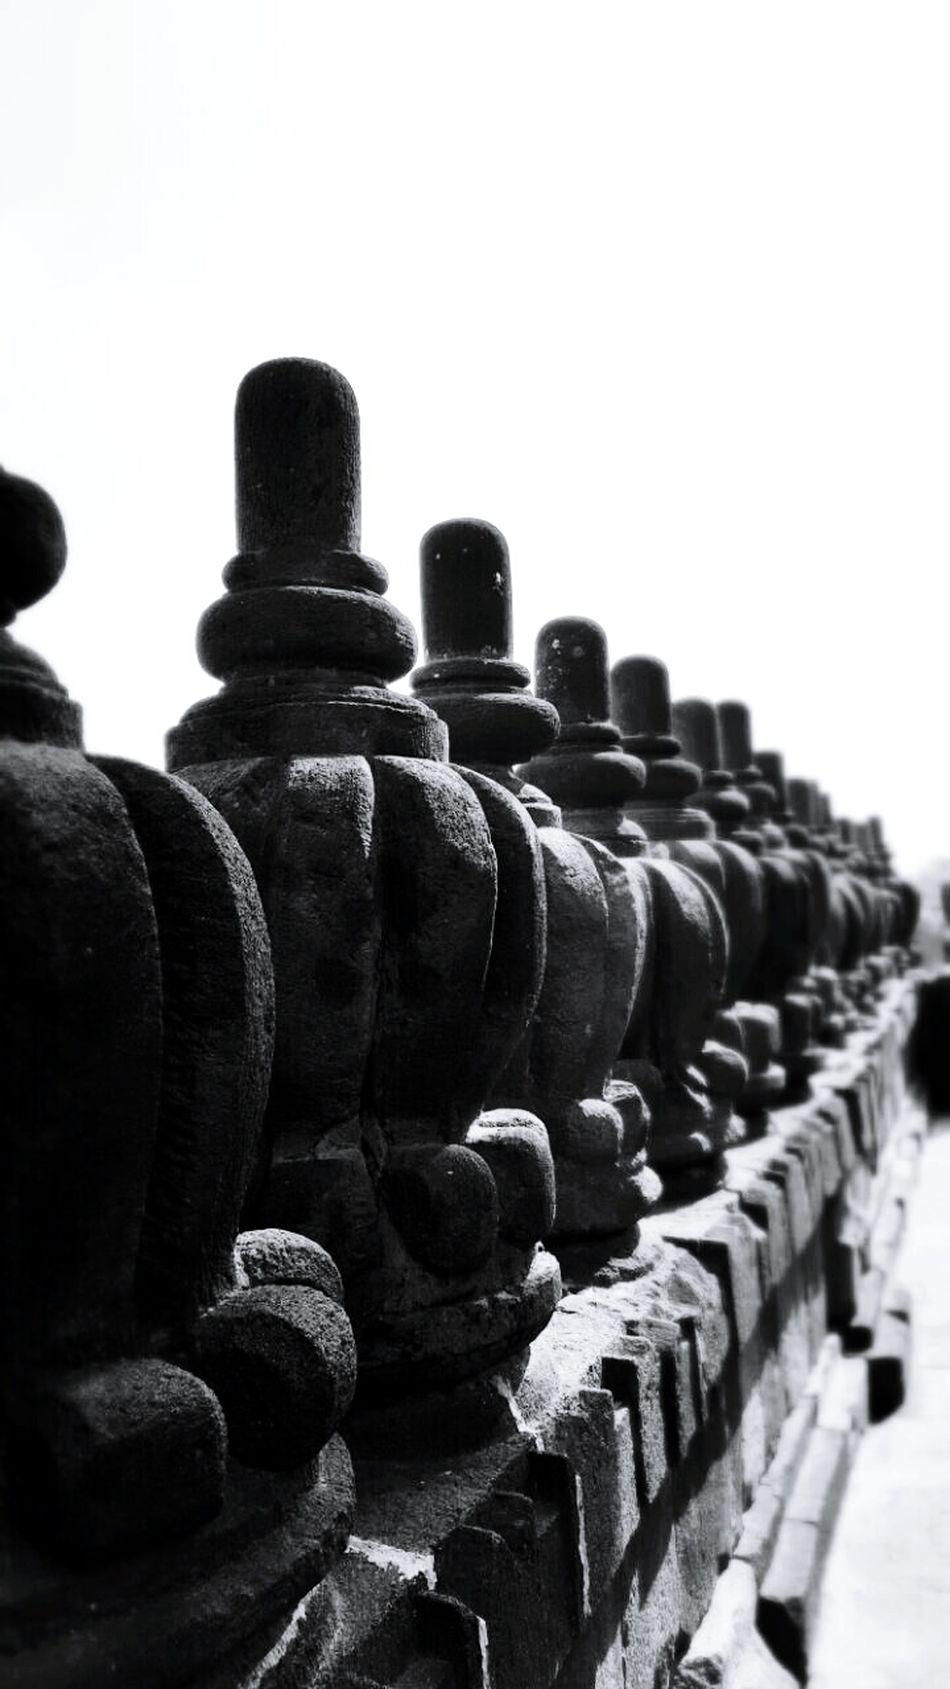 Arts Culture And Entertainment Prambanan Temple Stack Indonesia Culture Tourism Destination Outdoors Yogyakarta, Indonesia